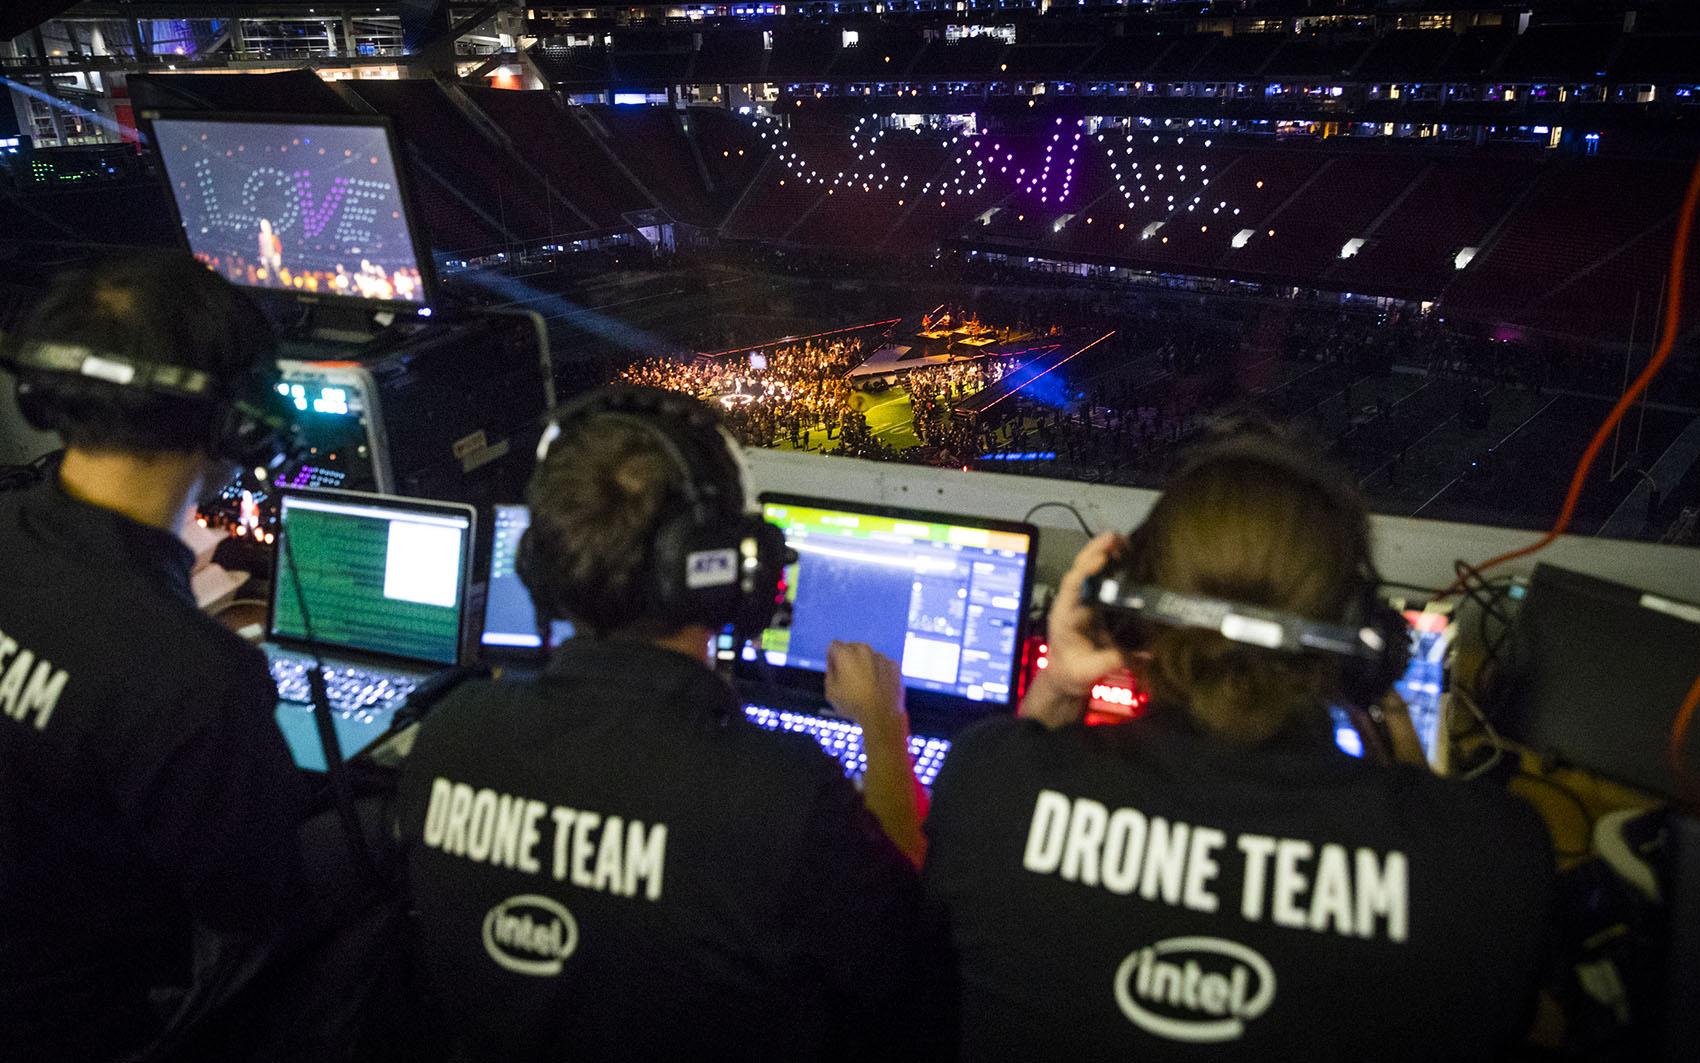 Intel Live Drone Light Show at Super Bowl LIII Halftime Show